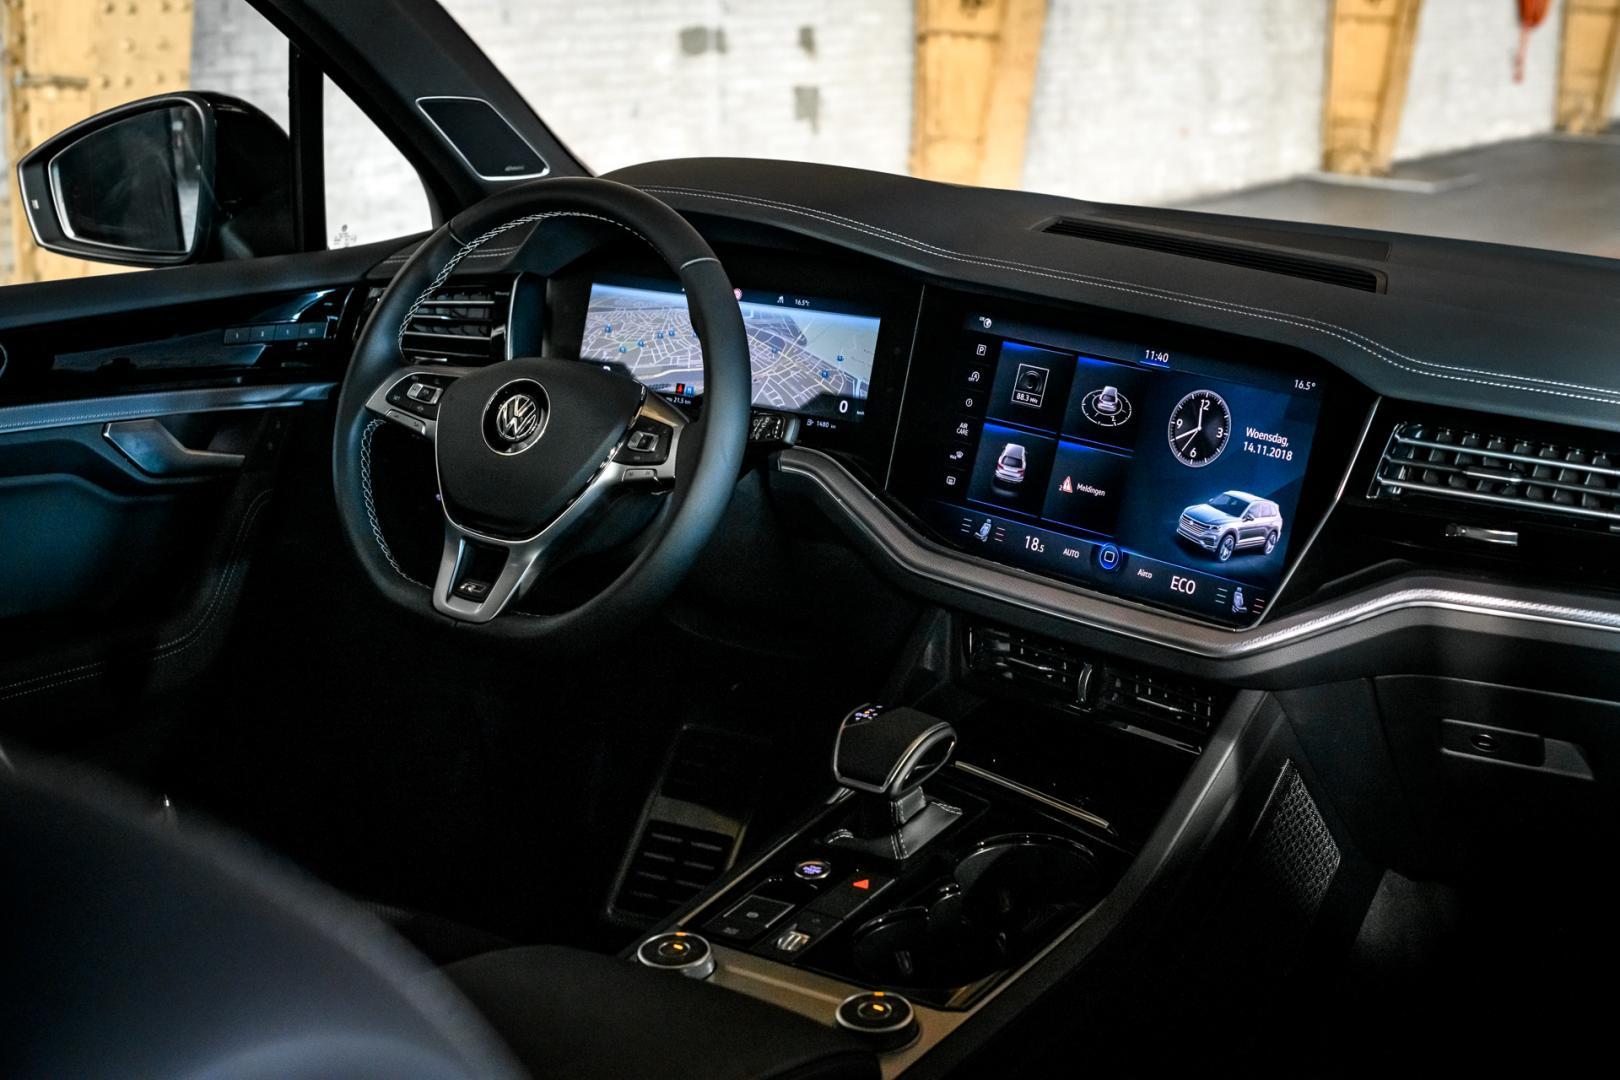 Volkswagen Touareg R-Line Black Style dashboard